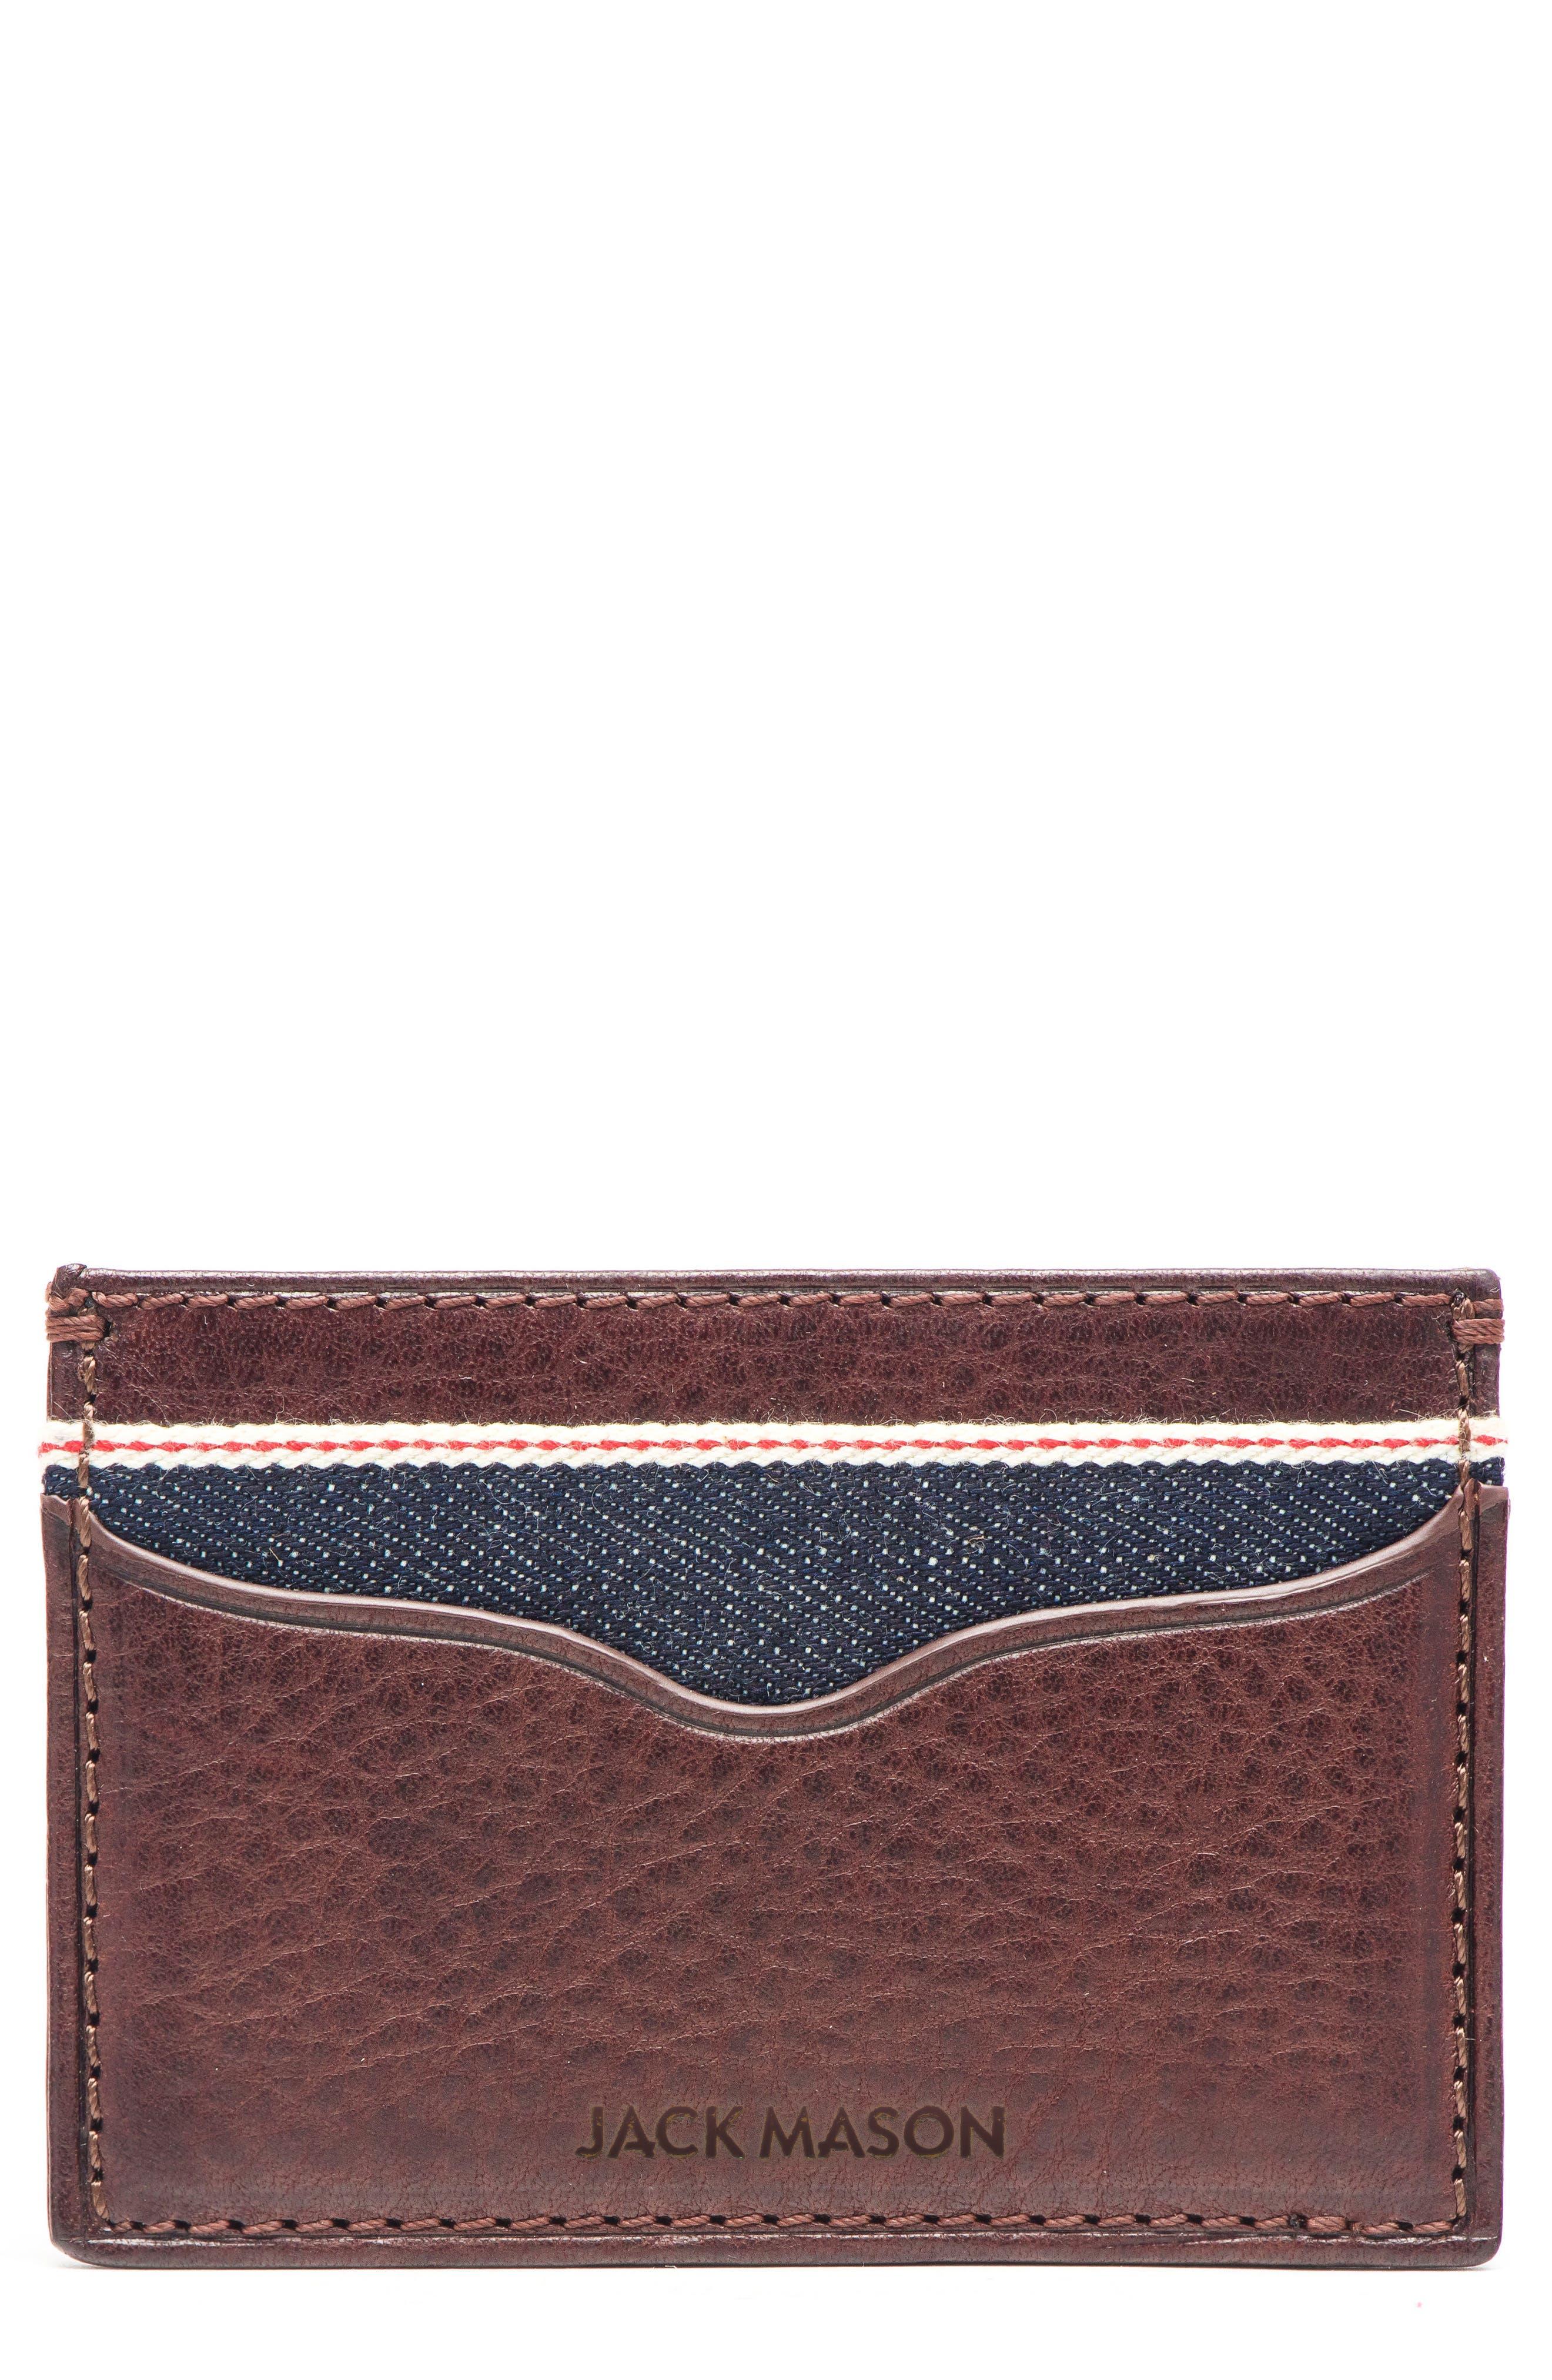 Leather & Denim Card Case,                             Main thumbnail 1, color,                             200